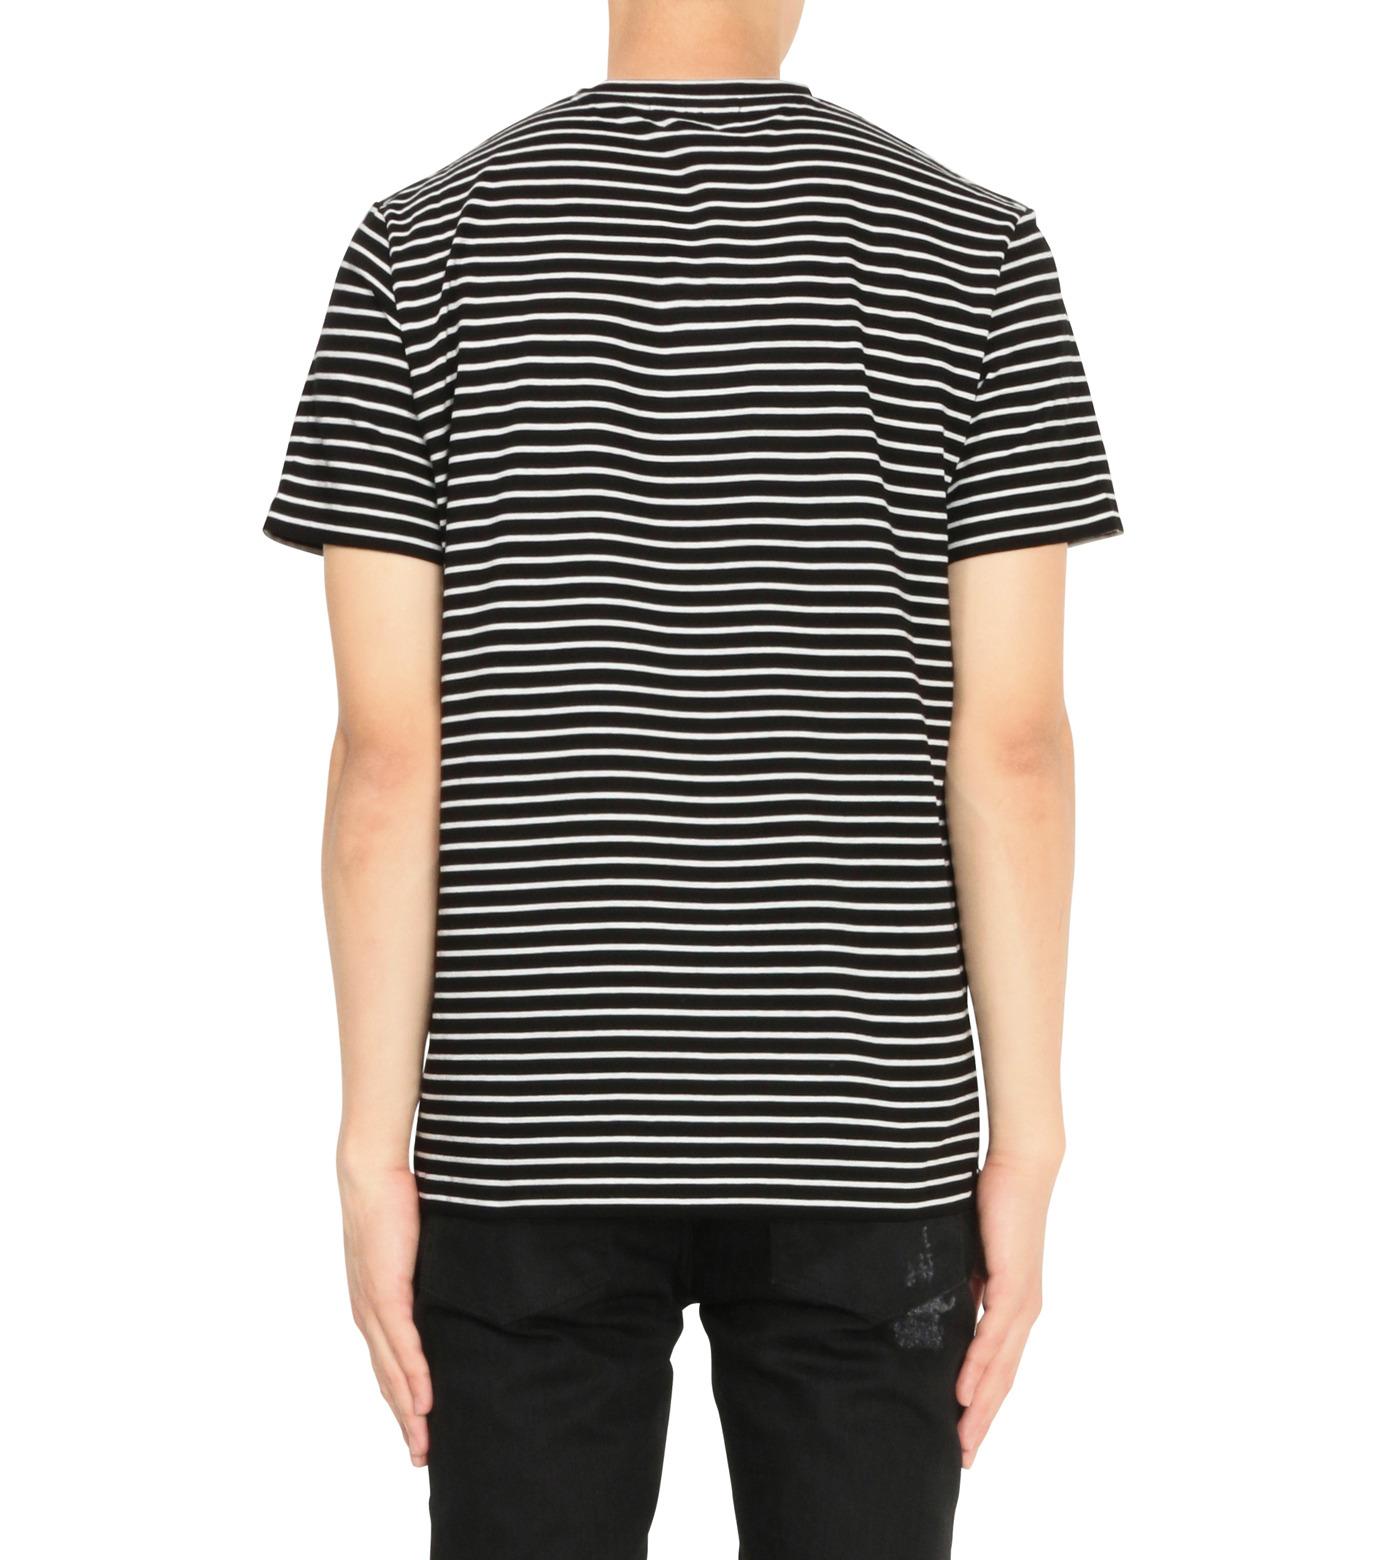 Alexander McQueen(アレキサンダーマックイーン)のBorder T Shirt-BLACK(カットソー/cut and sewn)-430934-13 拡大詳細画像2